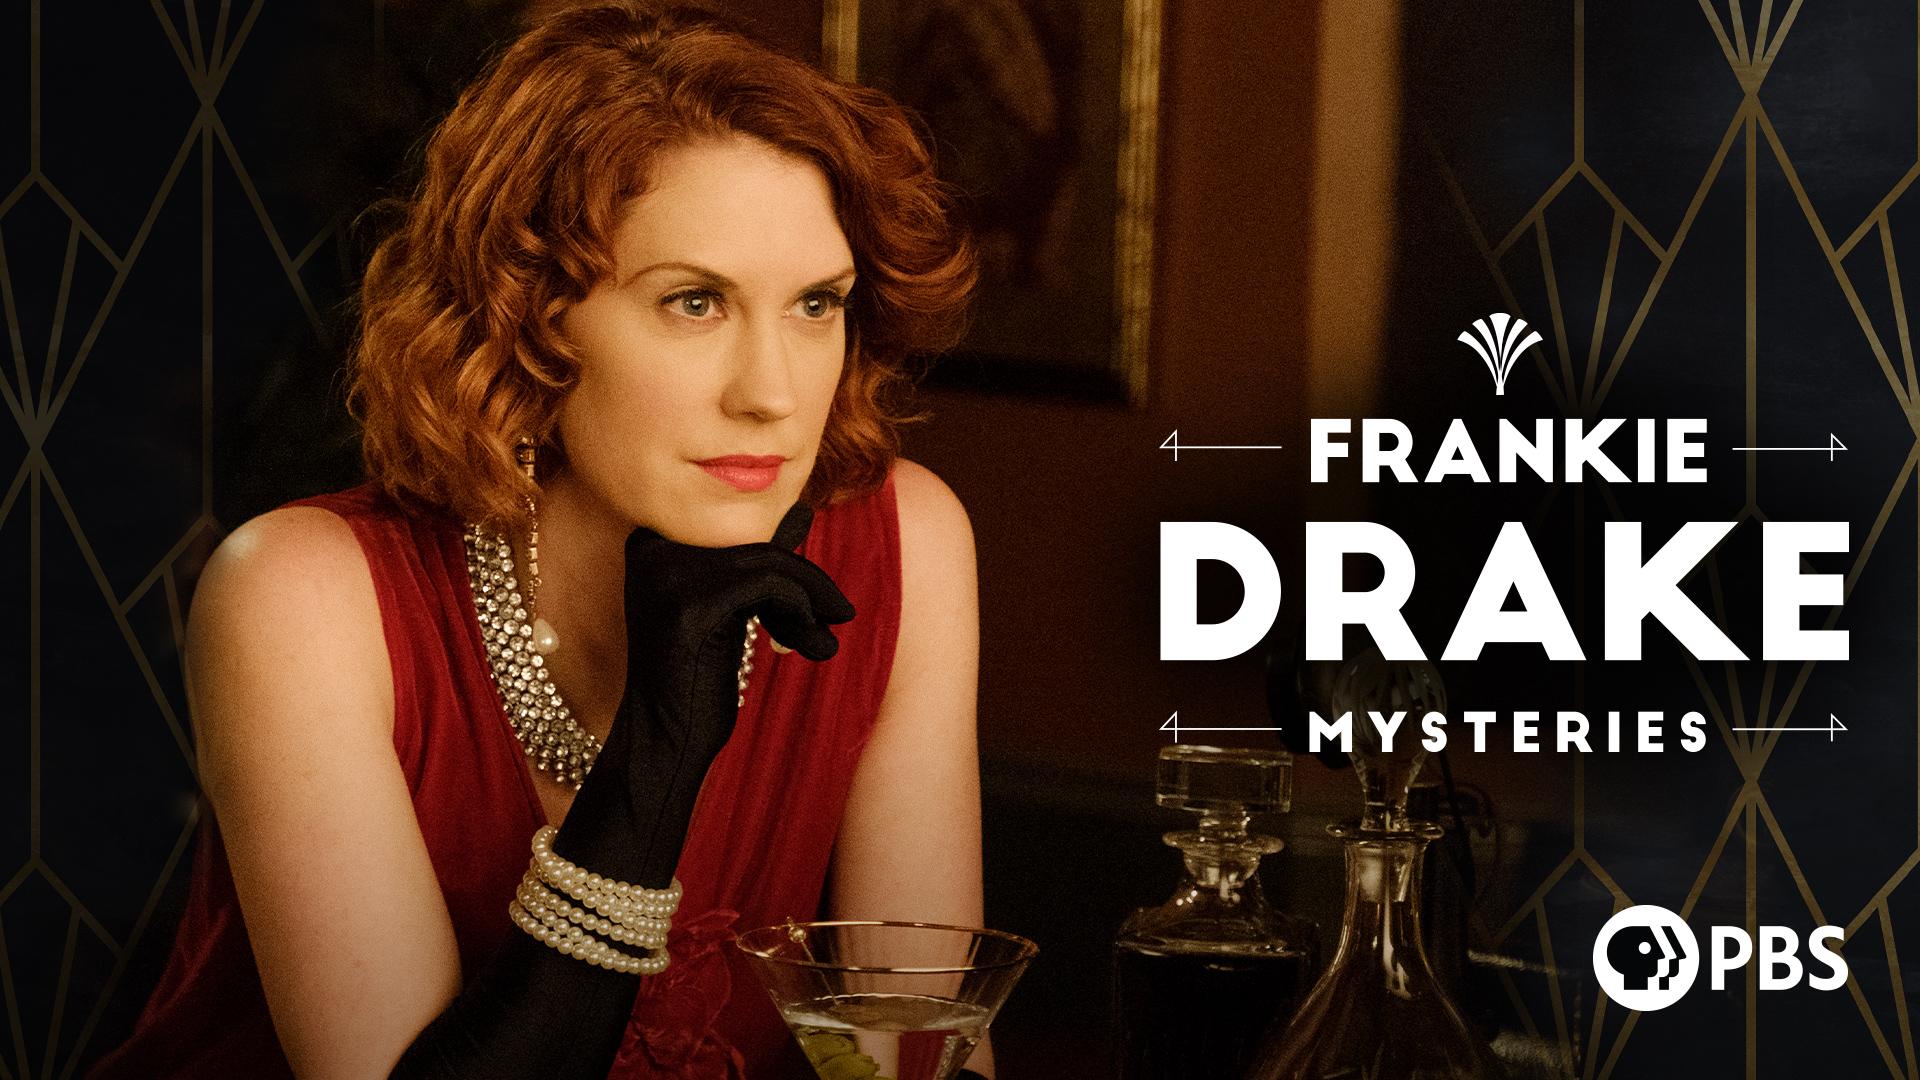 Frankie Drake Mysteries Season 1